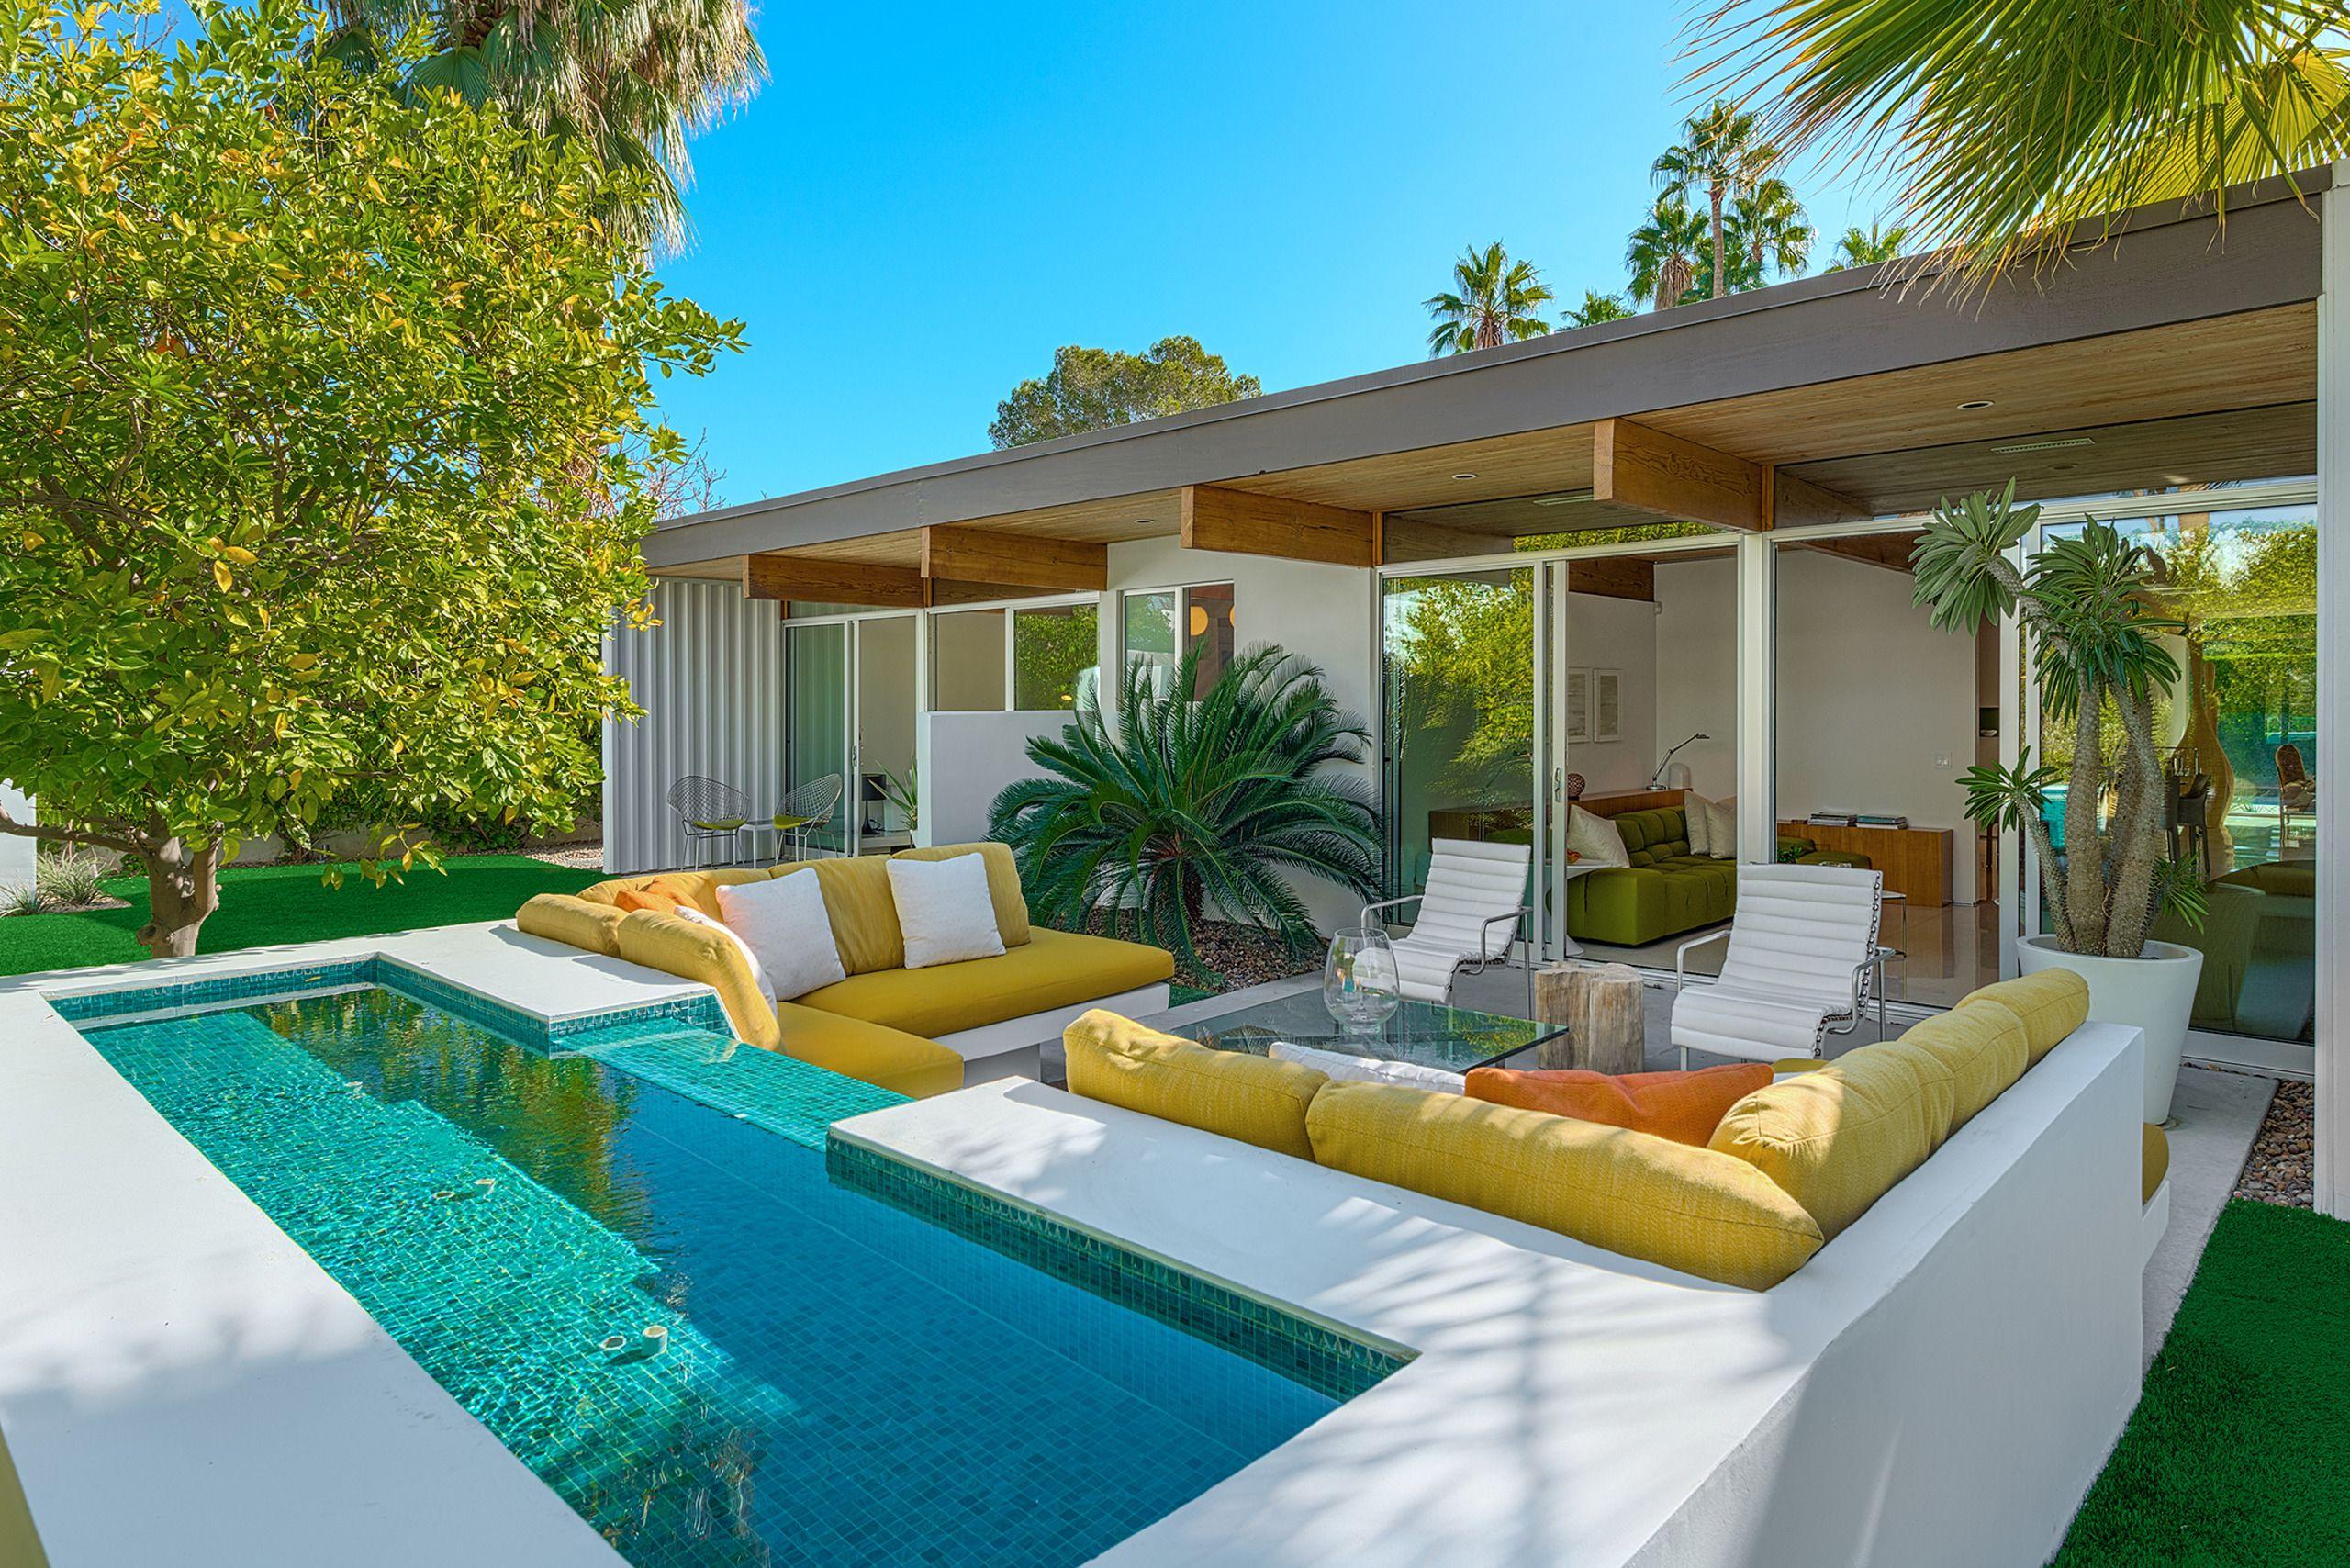 palm+springs+retro+kitchen | true testament to palm springs unique ...